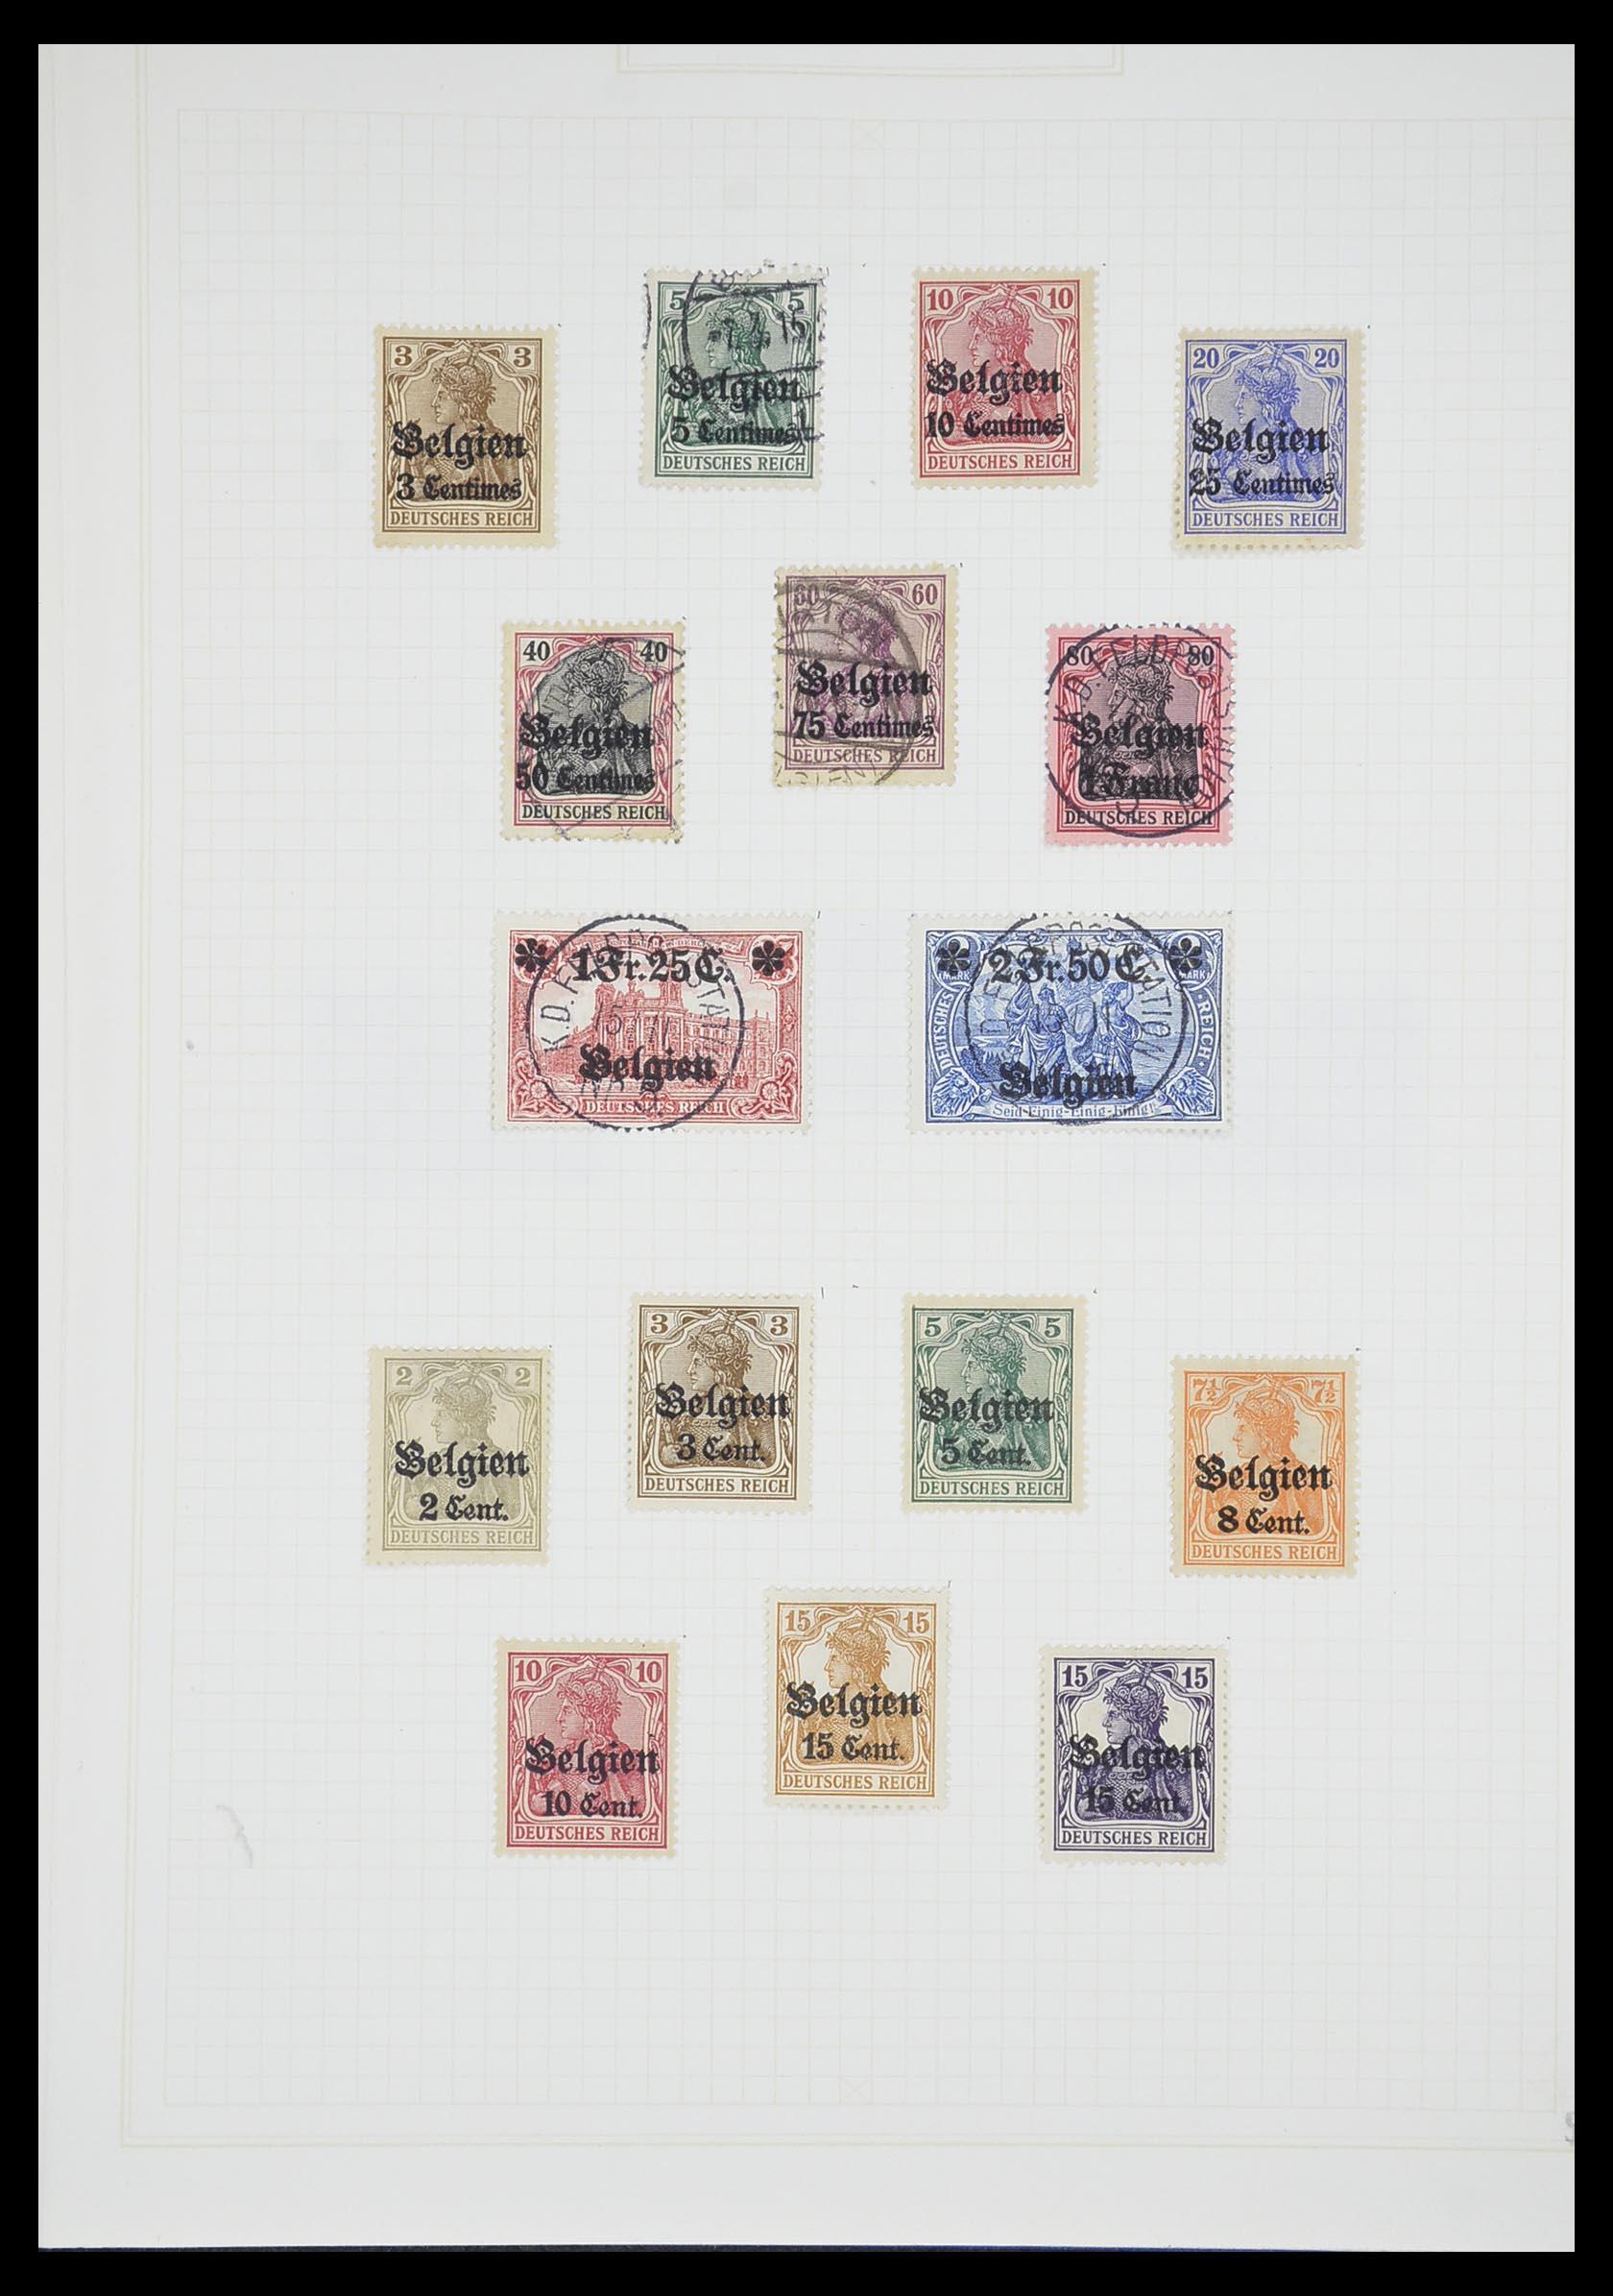 33713 001 - Postzegelverzameling 33713 Duitse bezettingen WO I en WO II 1914-1945